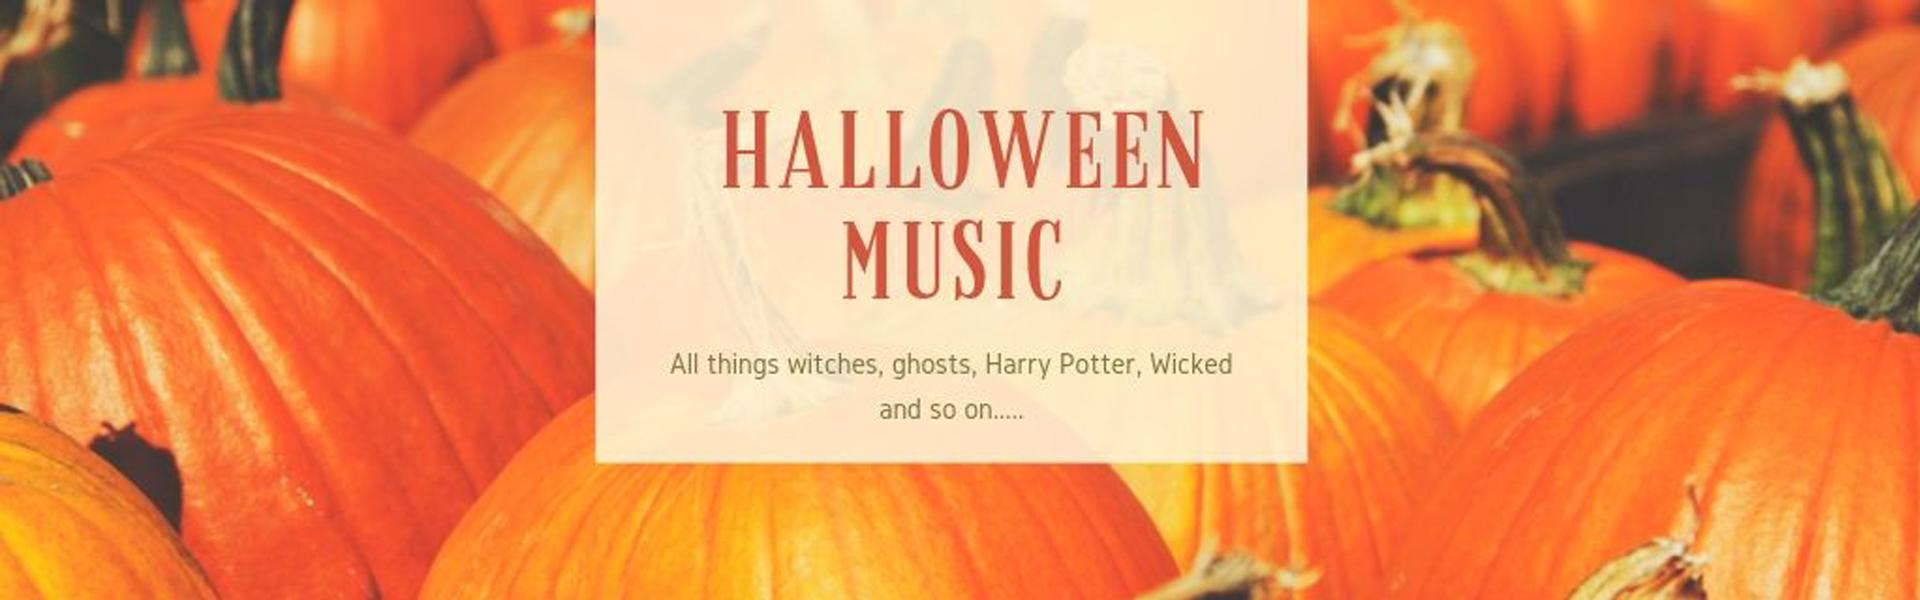 AFP Halloween Music Banner